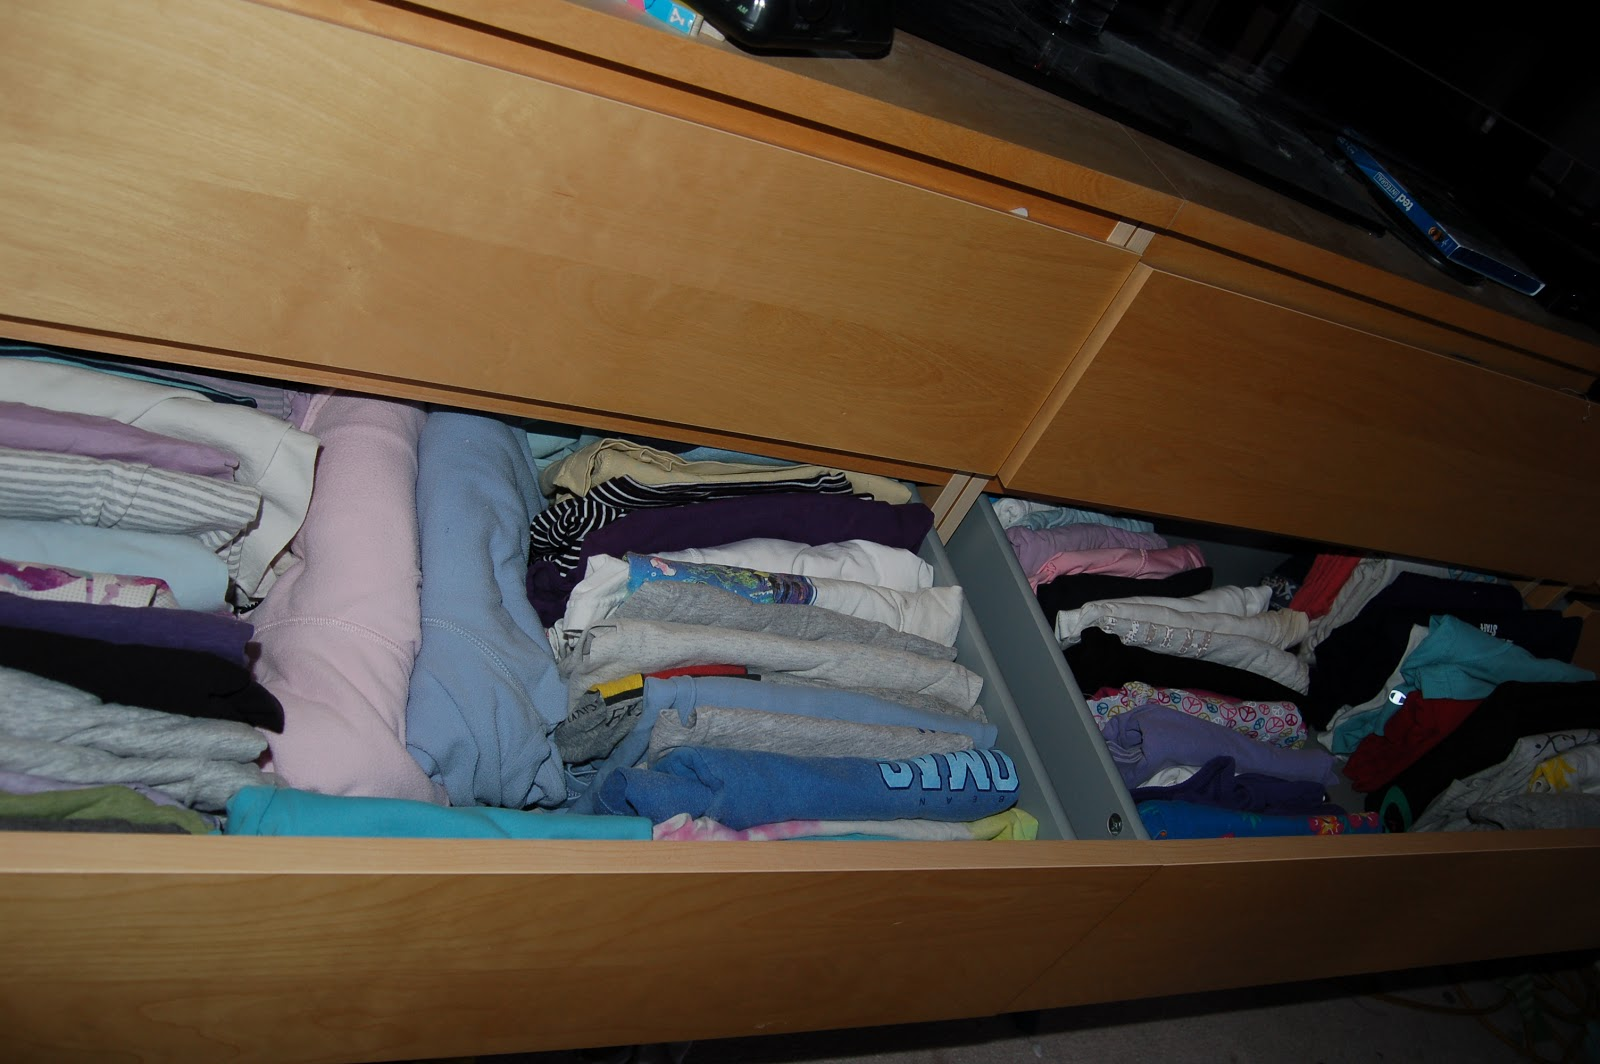 Baltic to boardwalk pinterst t shirt drawer organization for T shirt drawer organization